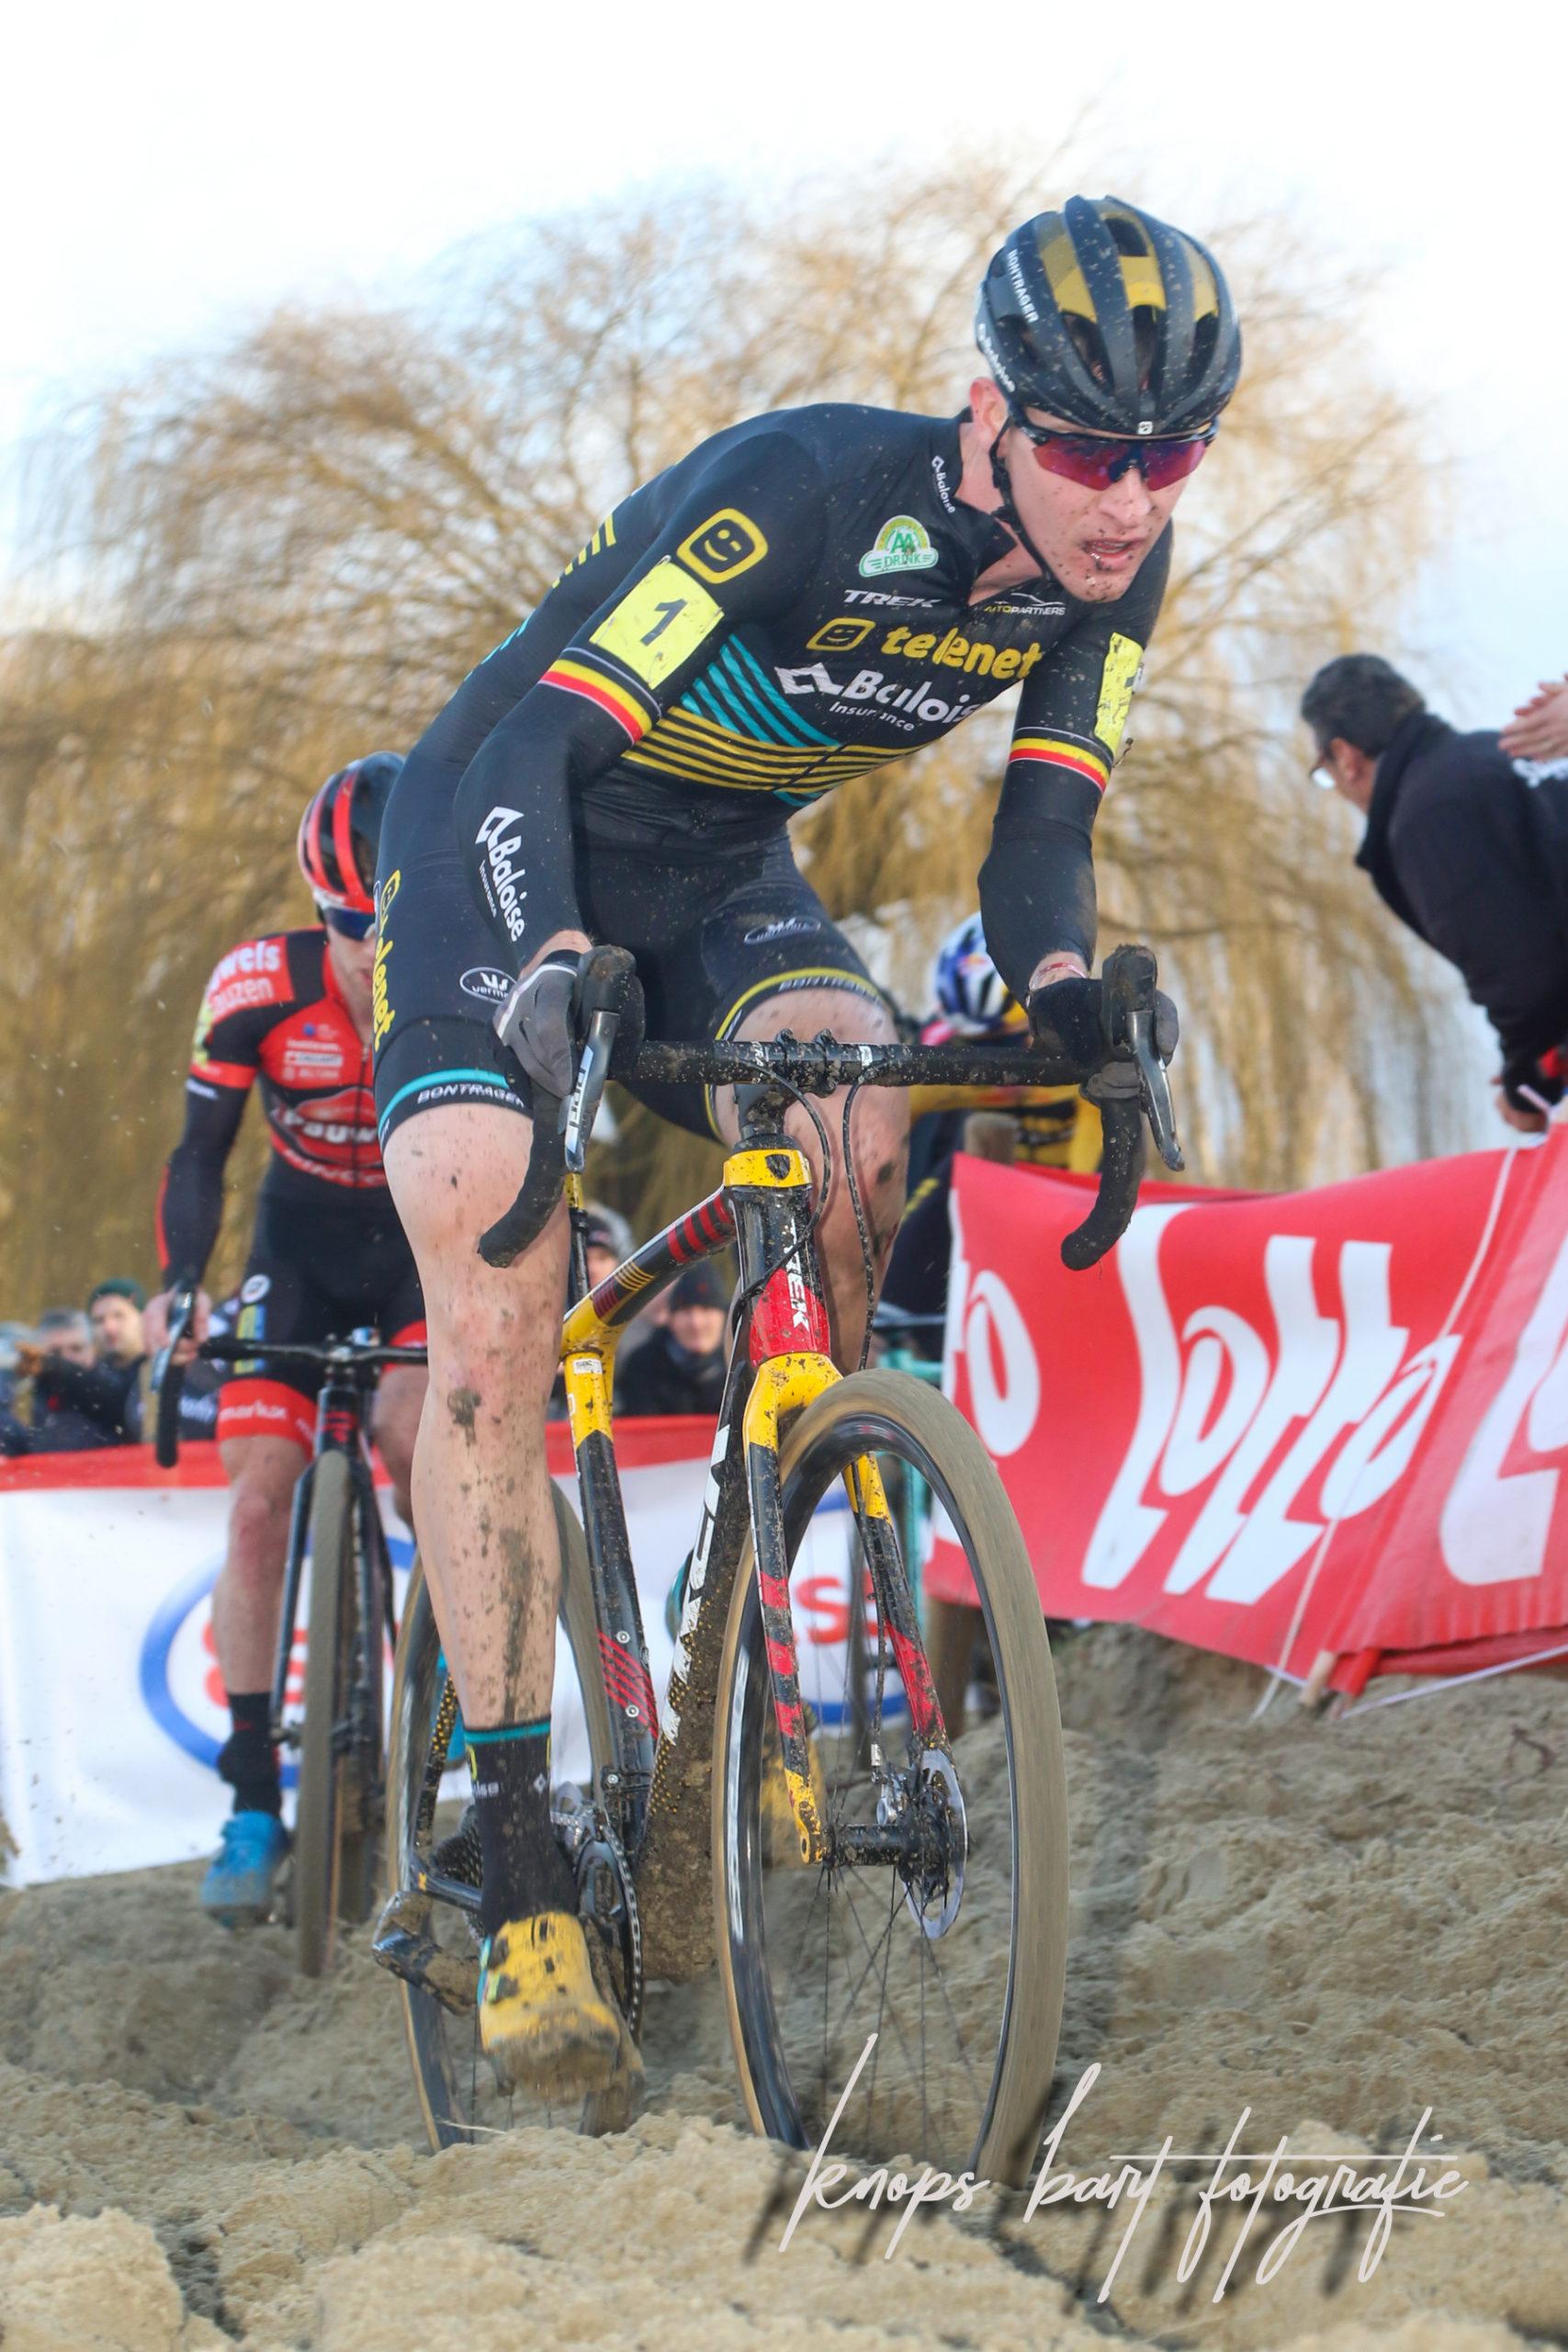 Toon Aerts is de sterkste in GP Leuven